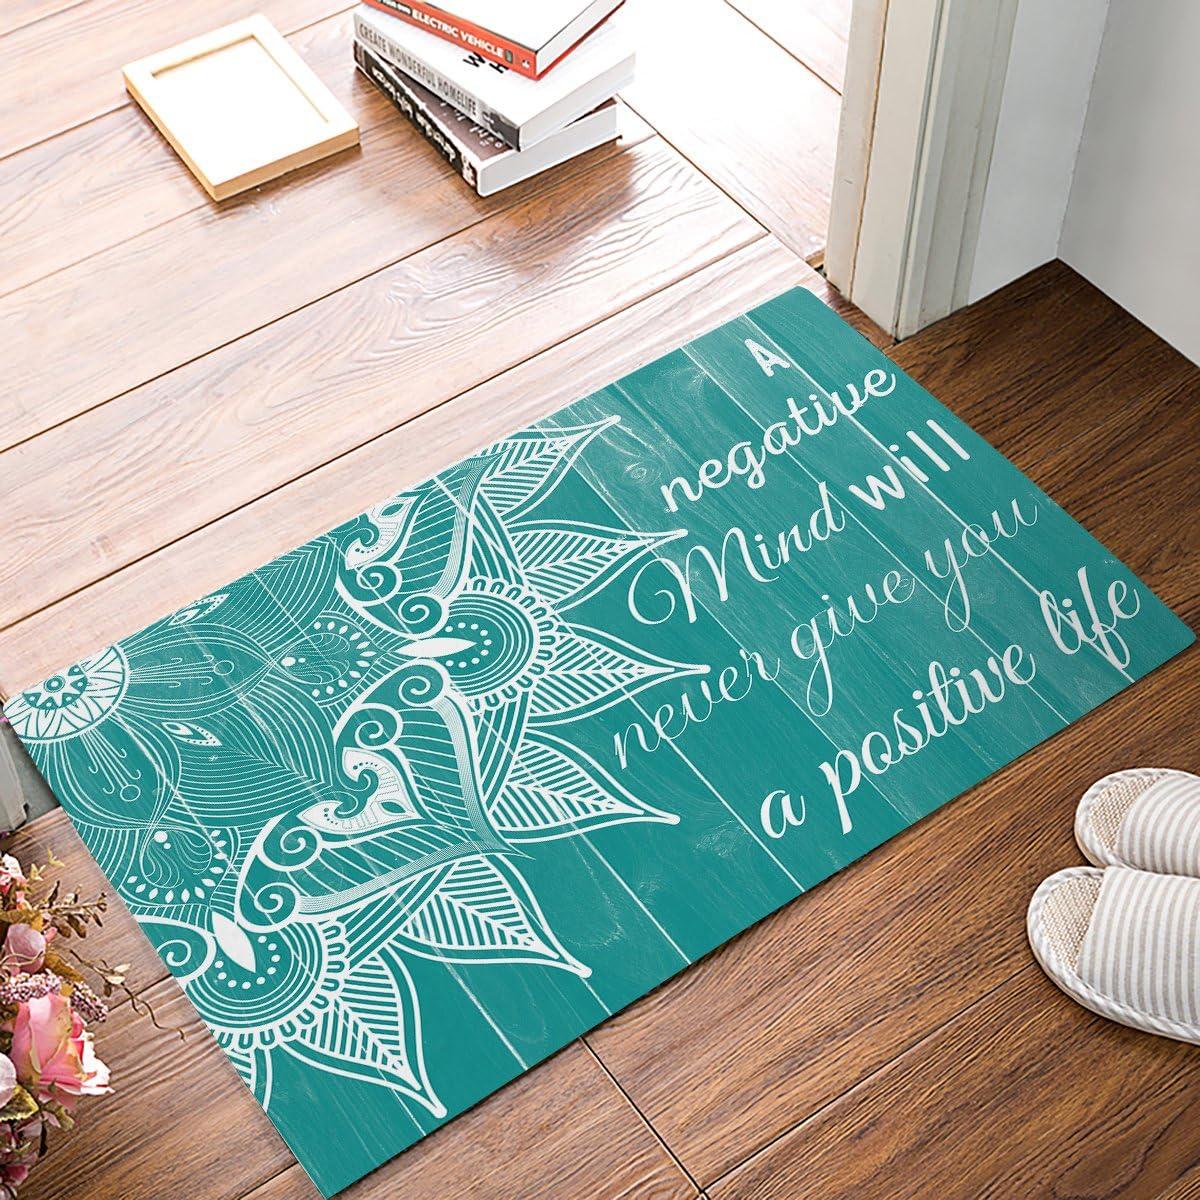 FAMILYDECOR Doormat for Entrance Way Indoor Bathroom Front Door Area Floor Mat Rugs Rubber Non Slip Absorb Kitchen Runner Carpet, Teal Mandala Wooden Board Pattern with Life Quotes 30 x18